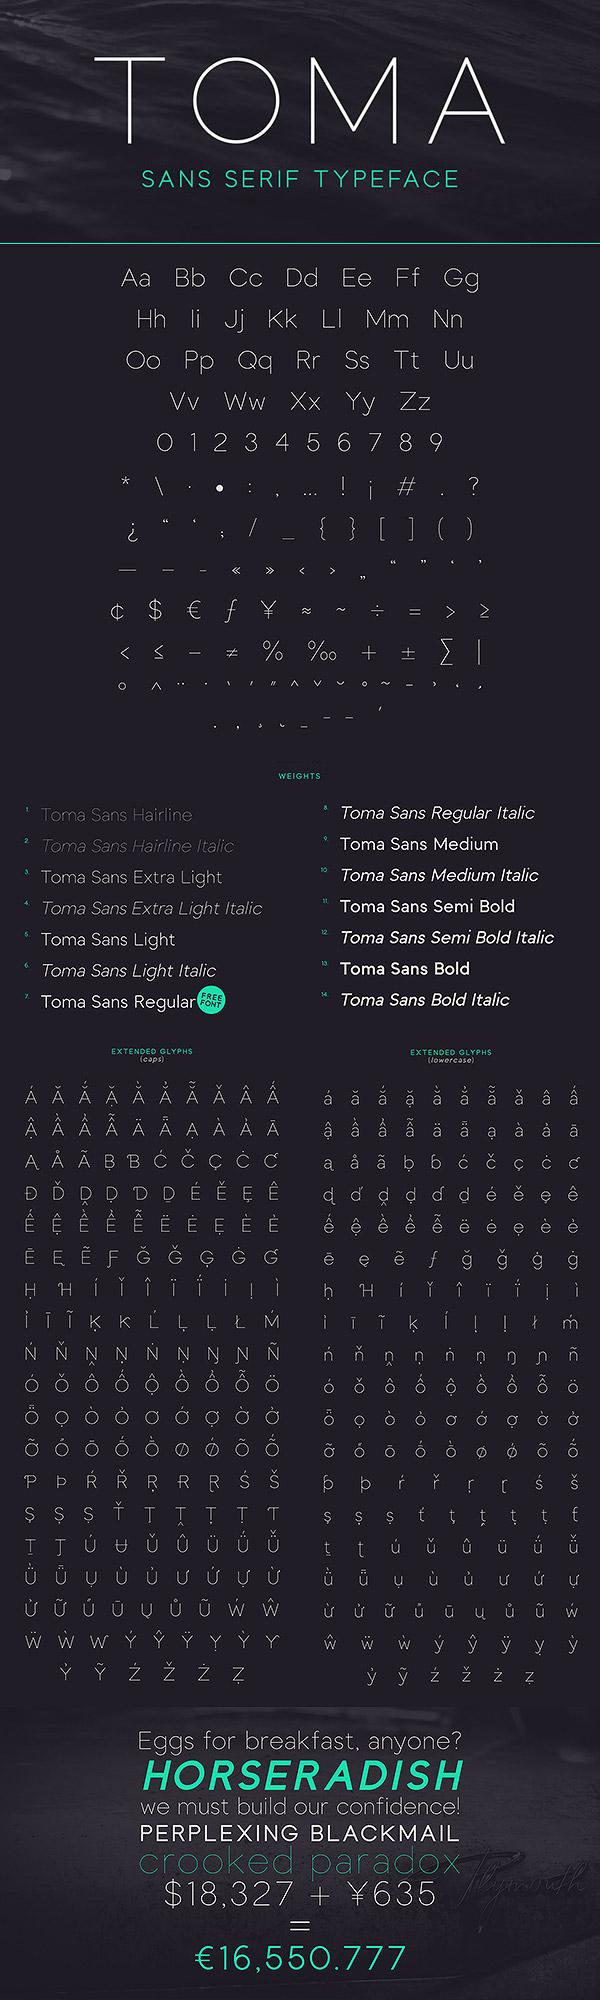 Free Font - Toma Sans